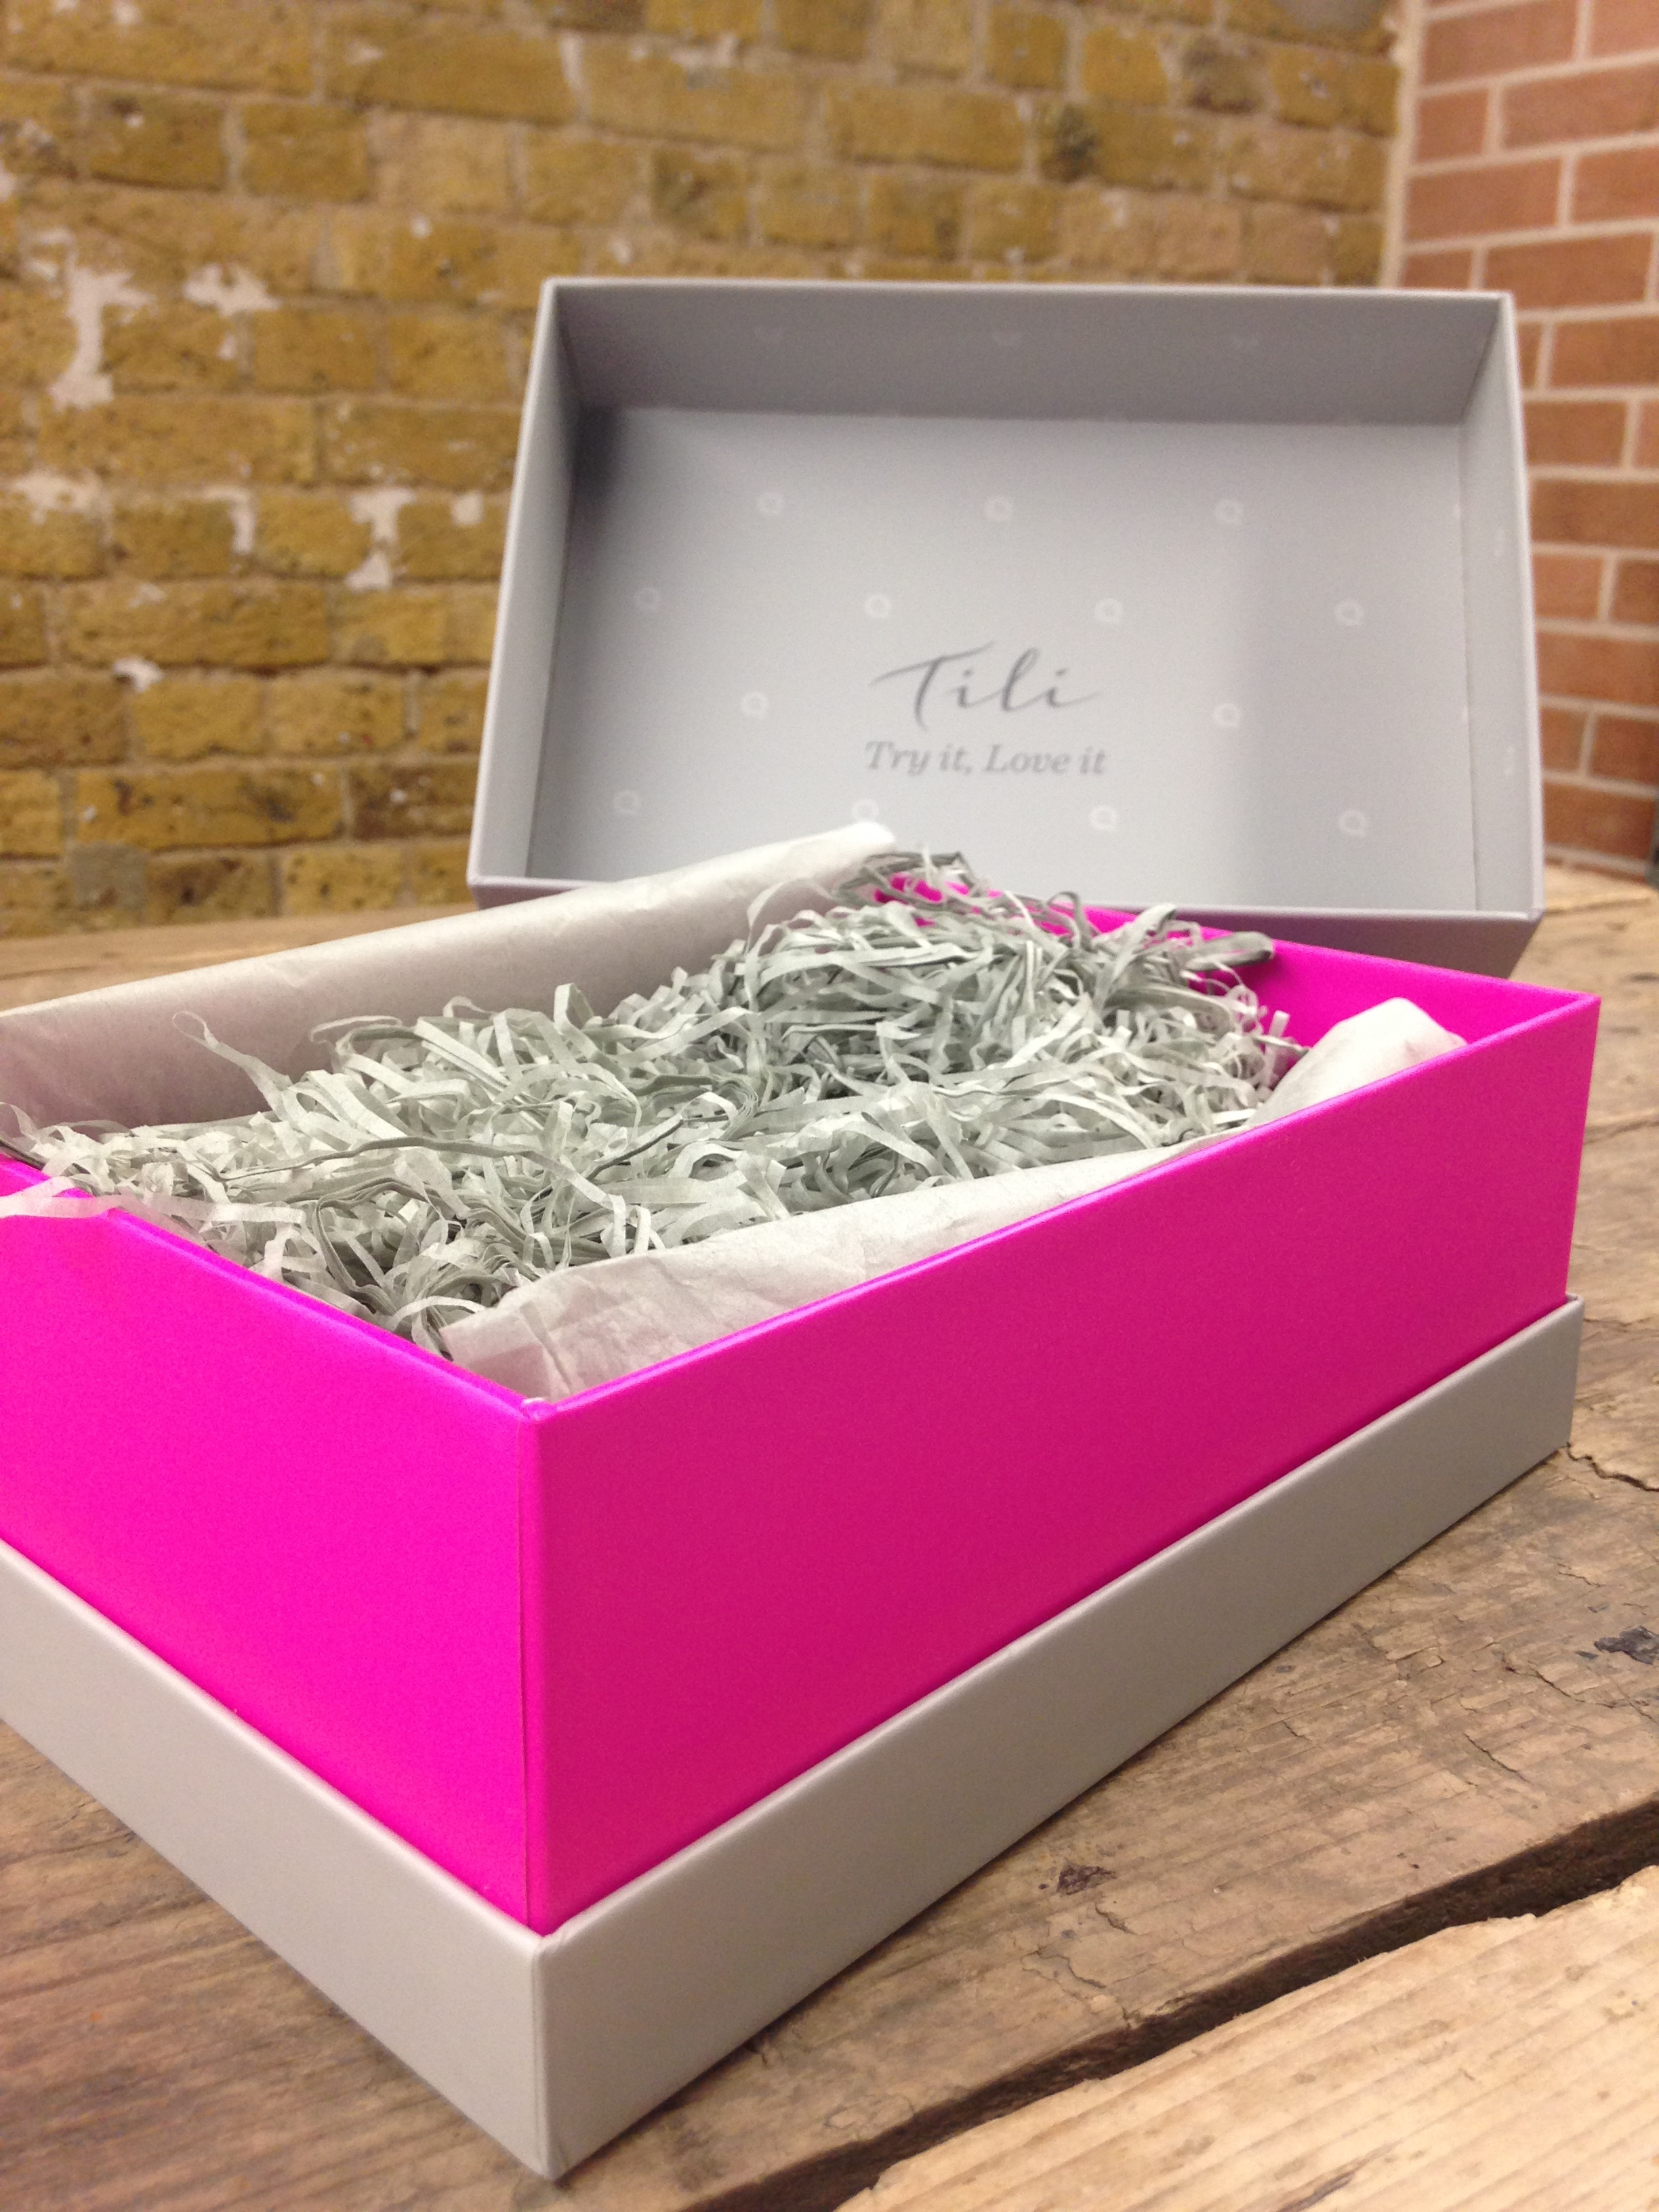 QVC Pink Tili Box